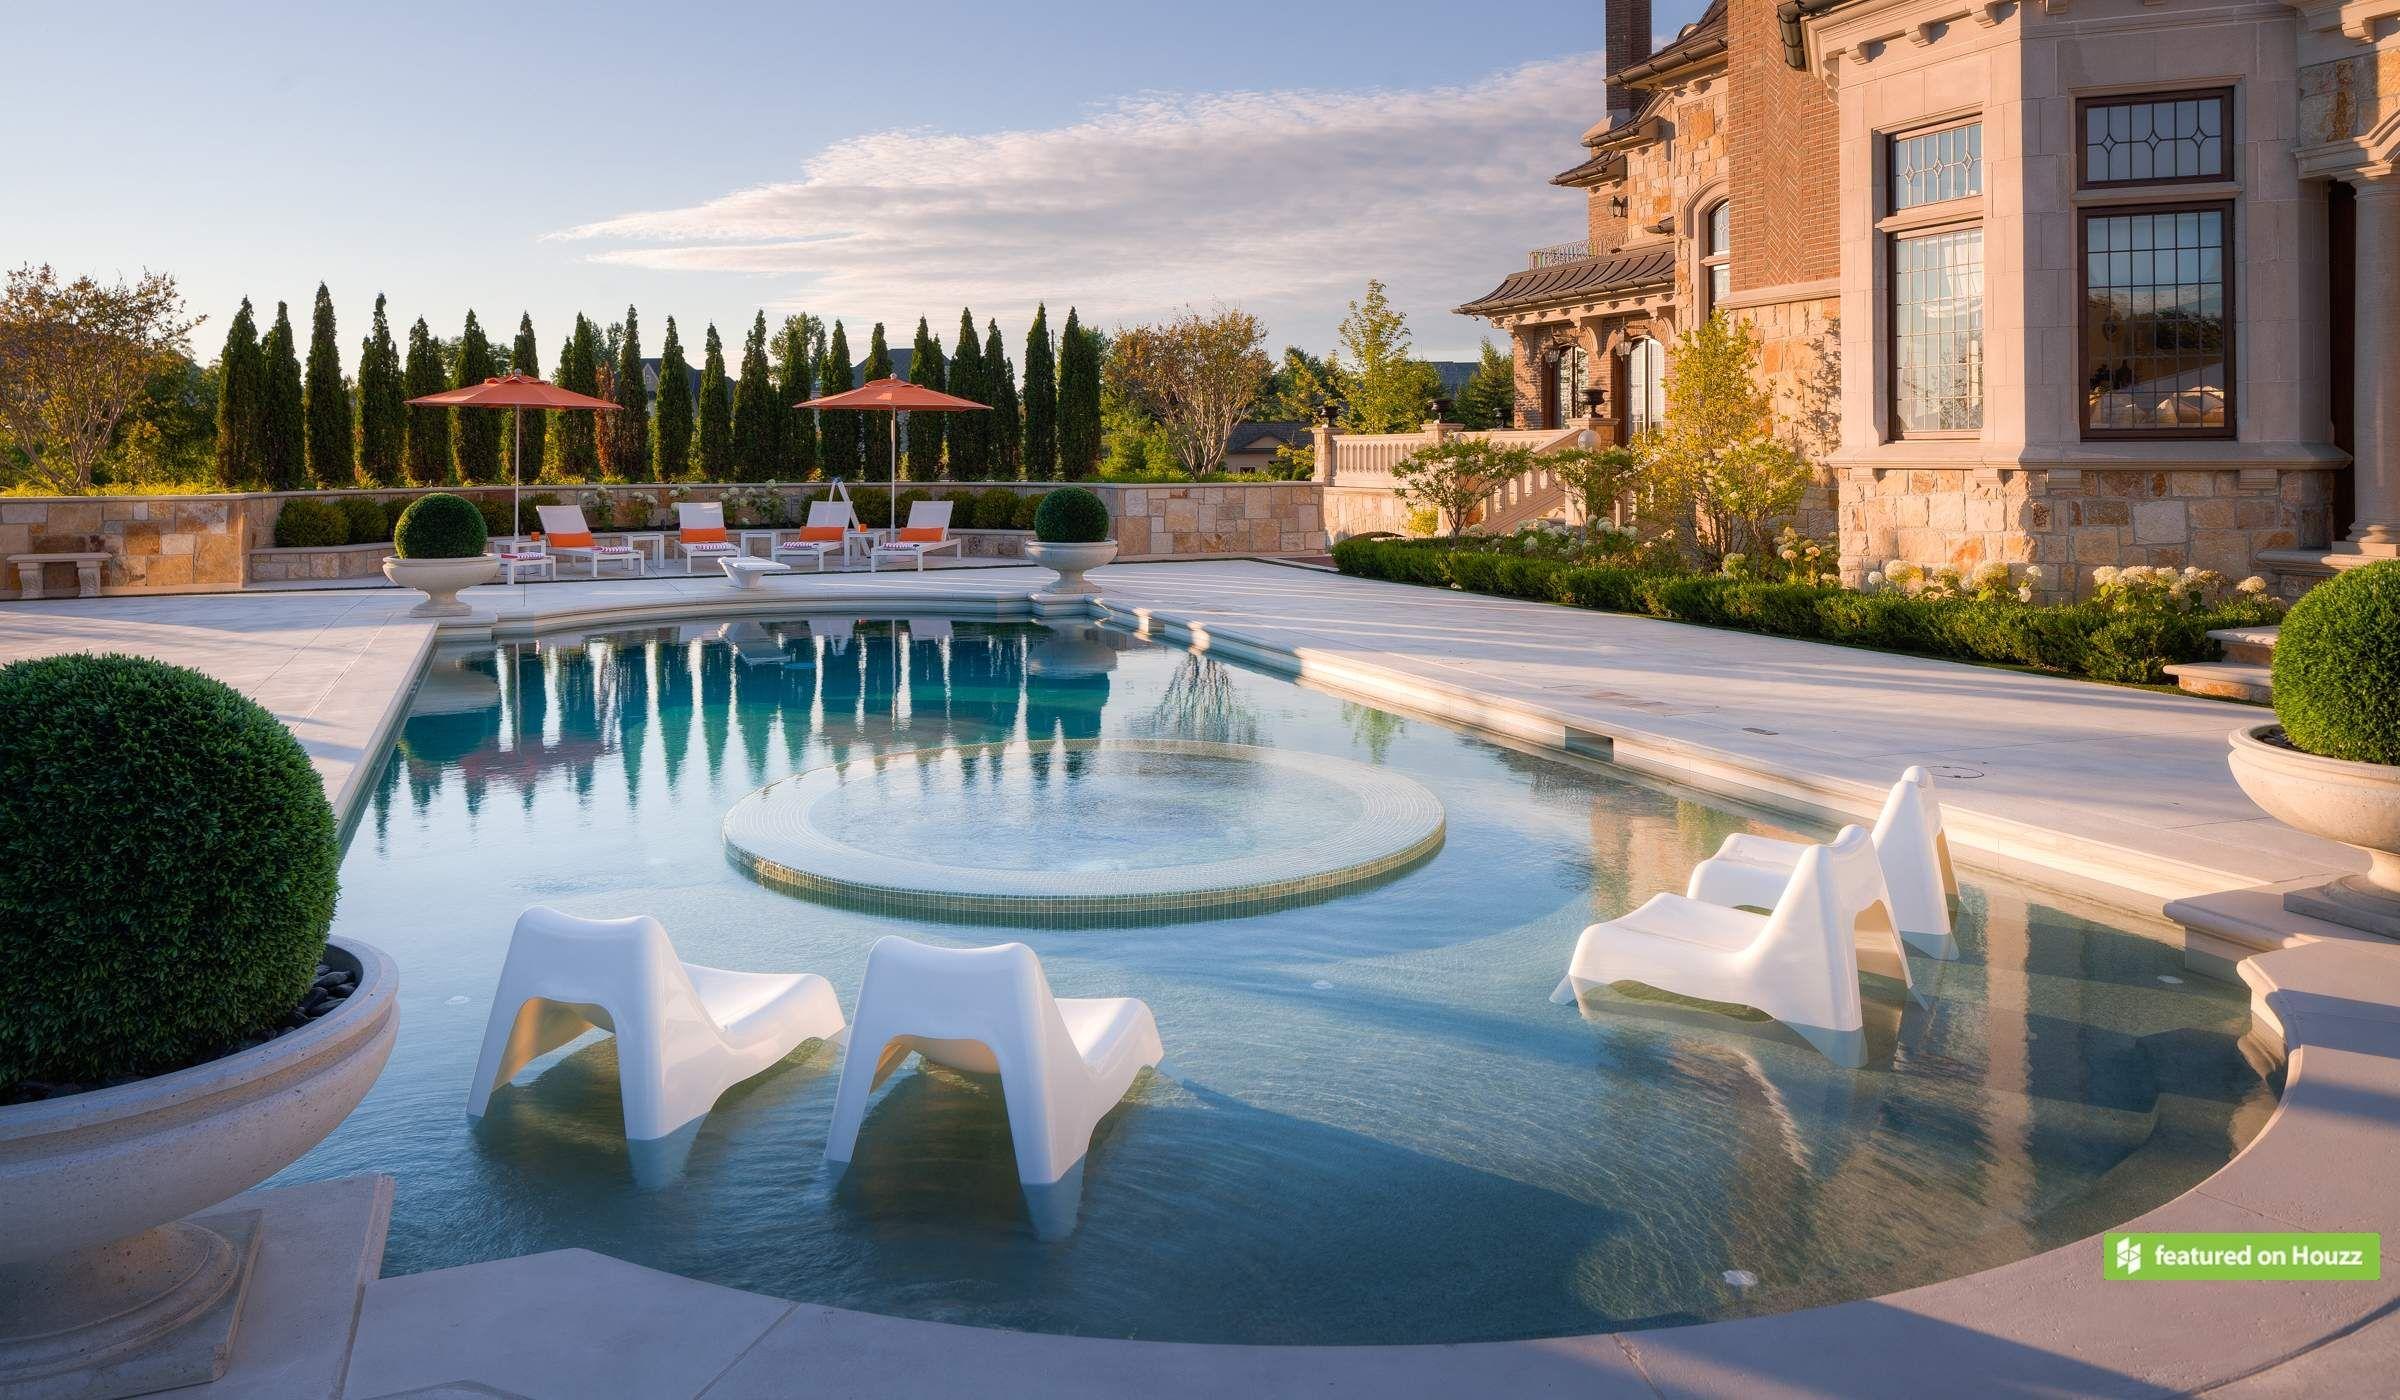 Geometric Betz Pools Pools Backyard Inground Pool Houses Building A Pool